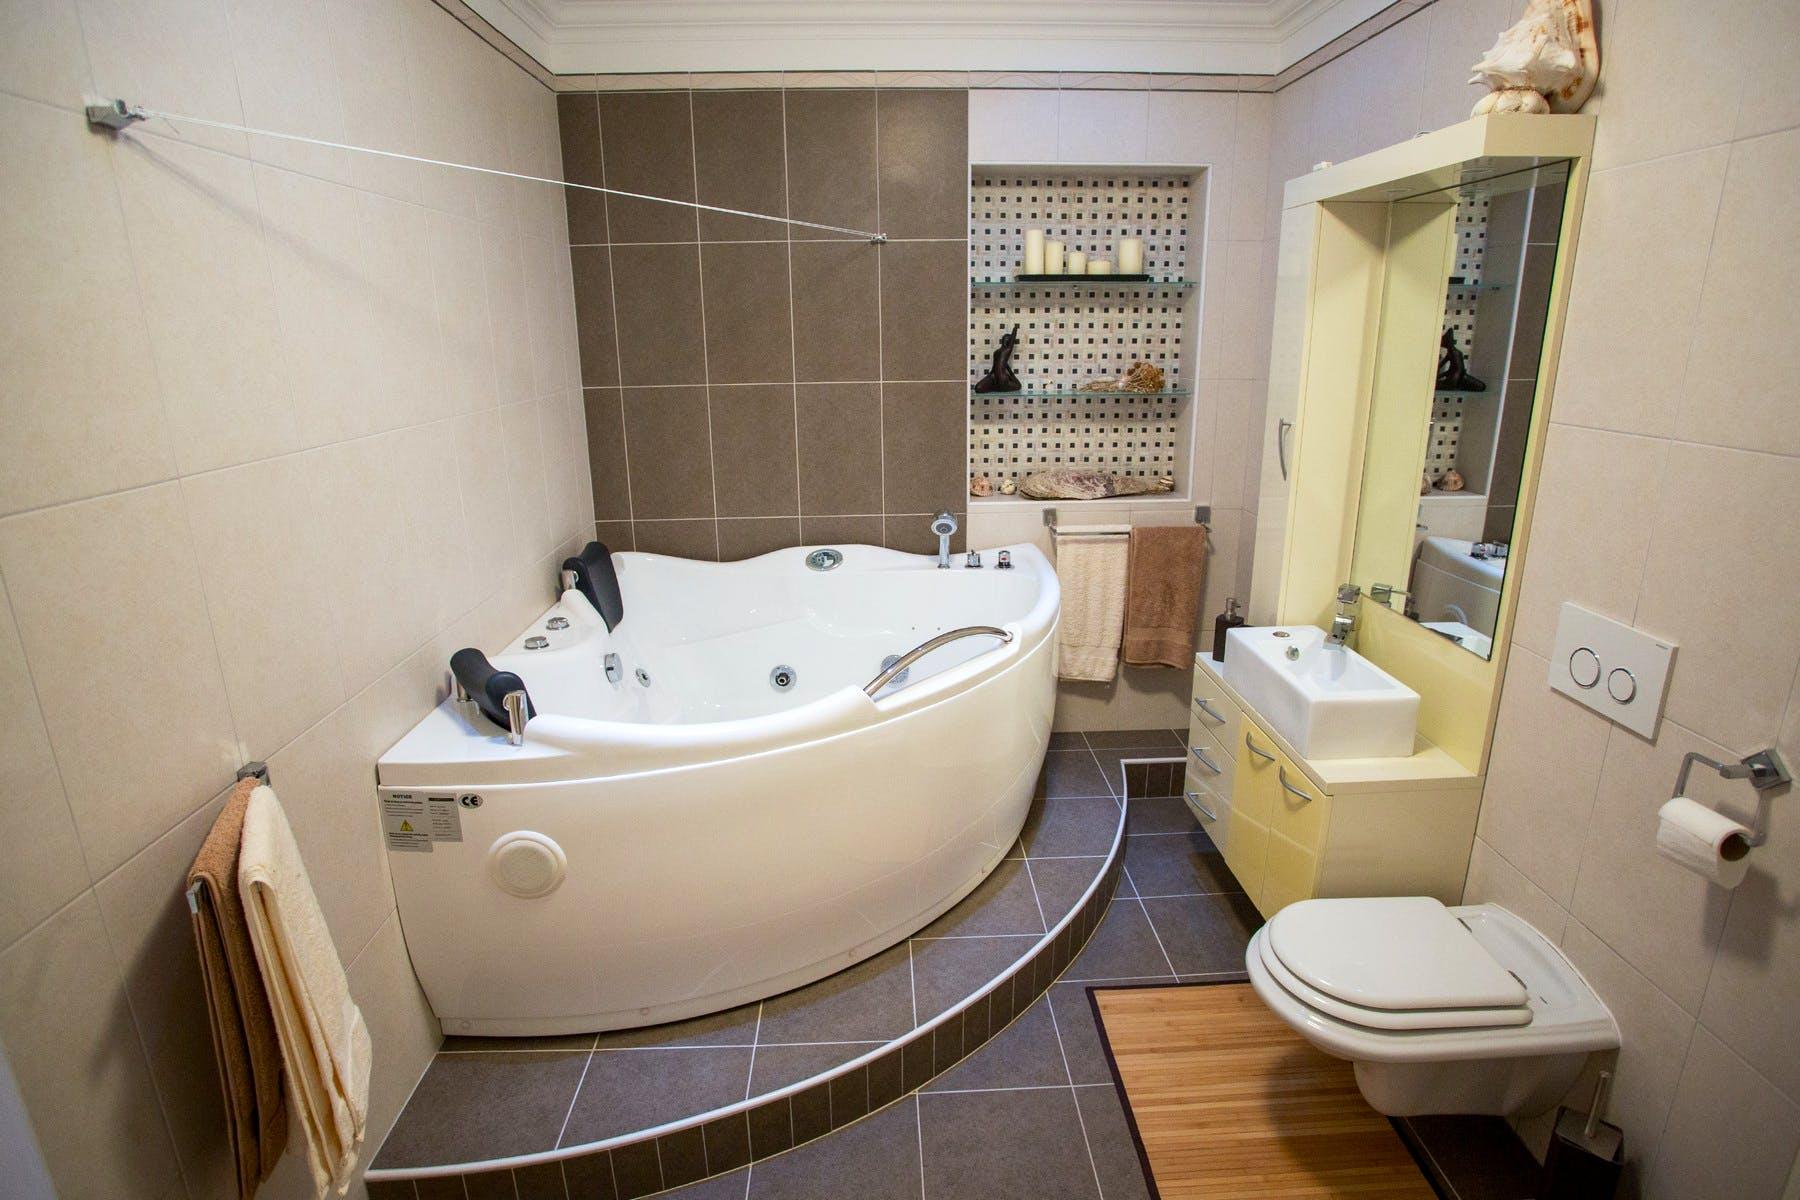 Spacious bathroom with whirlpool tub